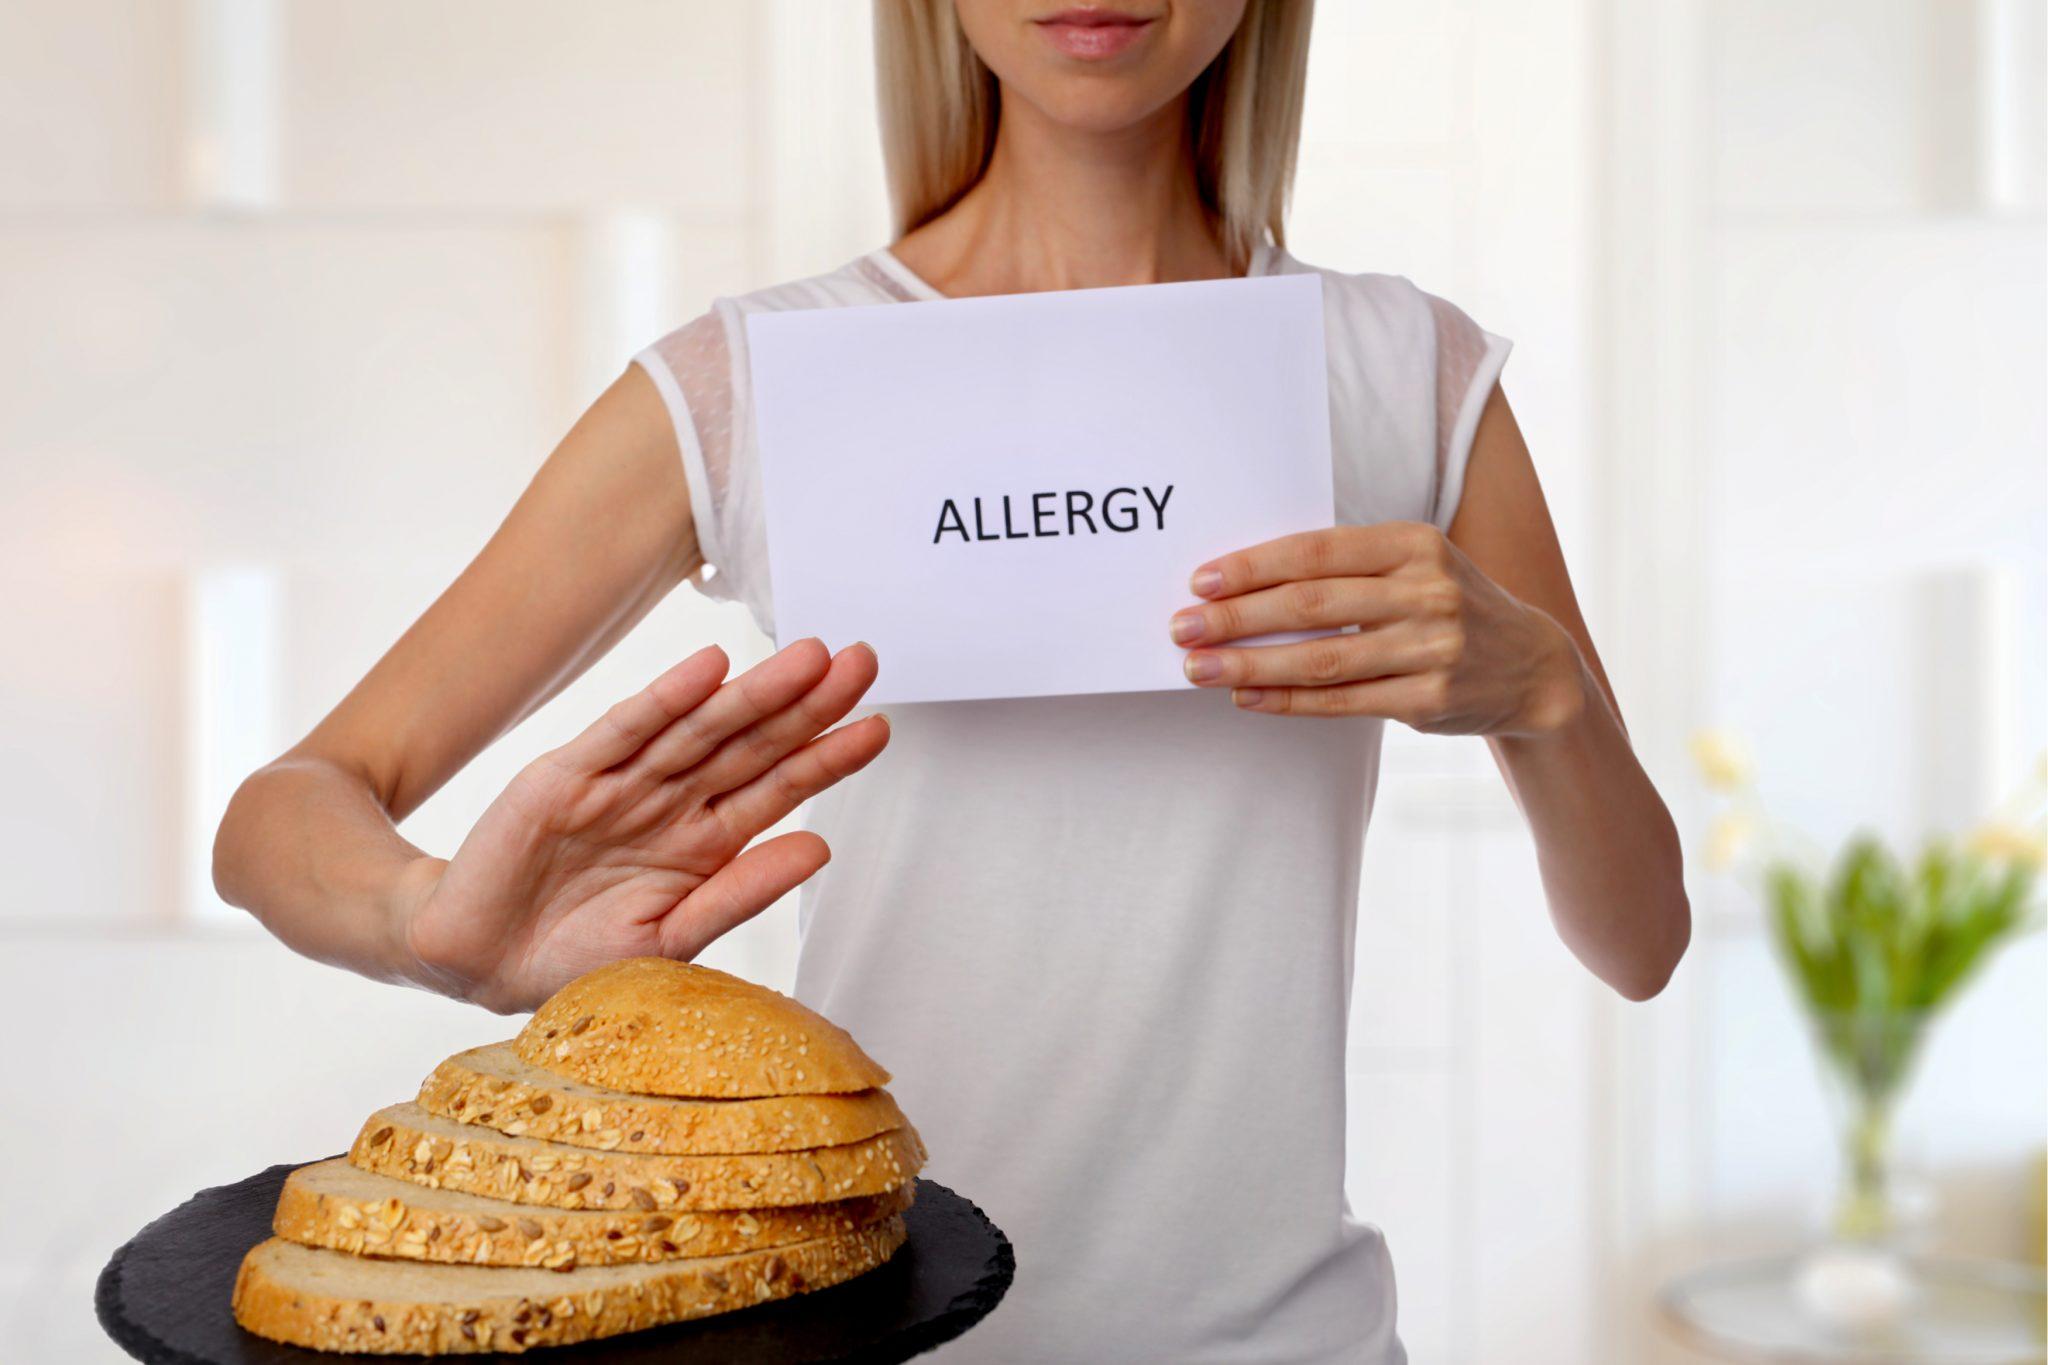 小麦アレルギー